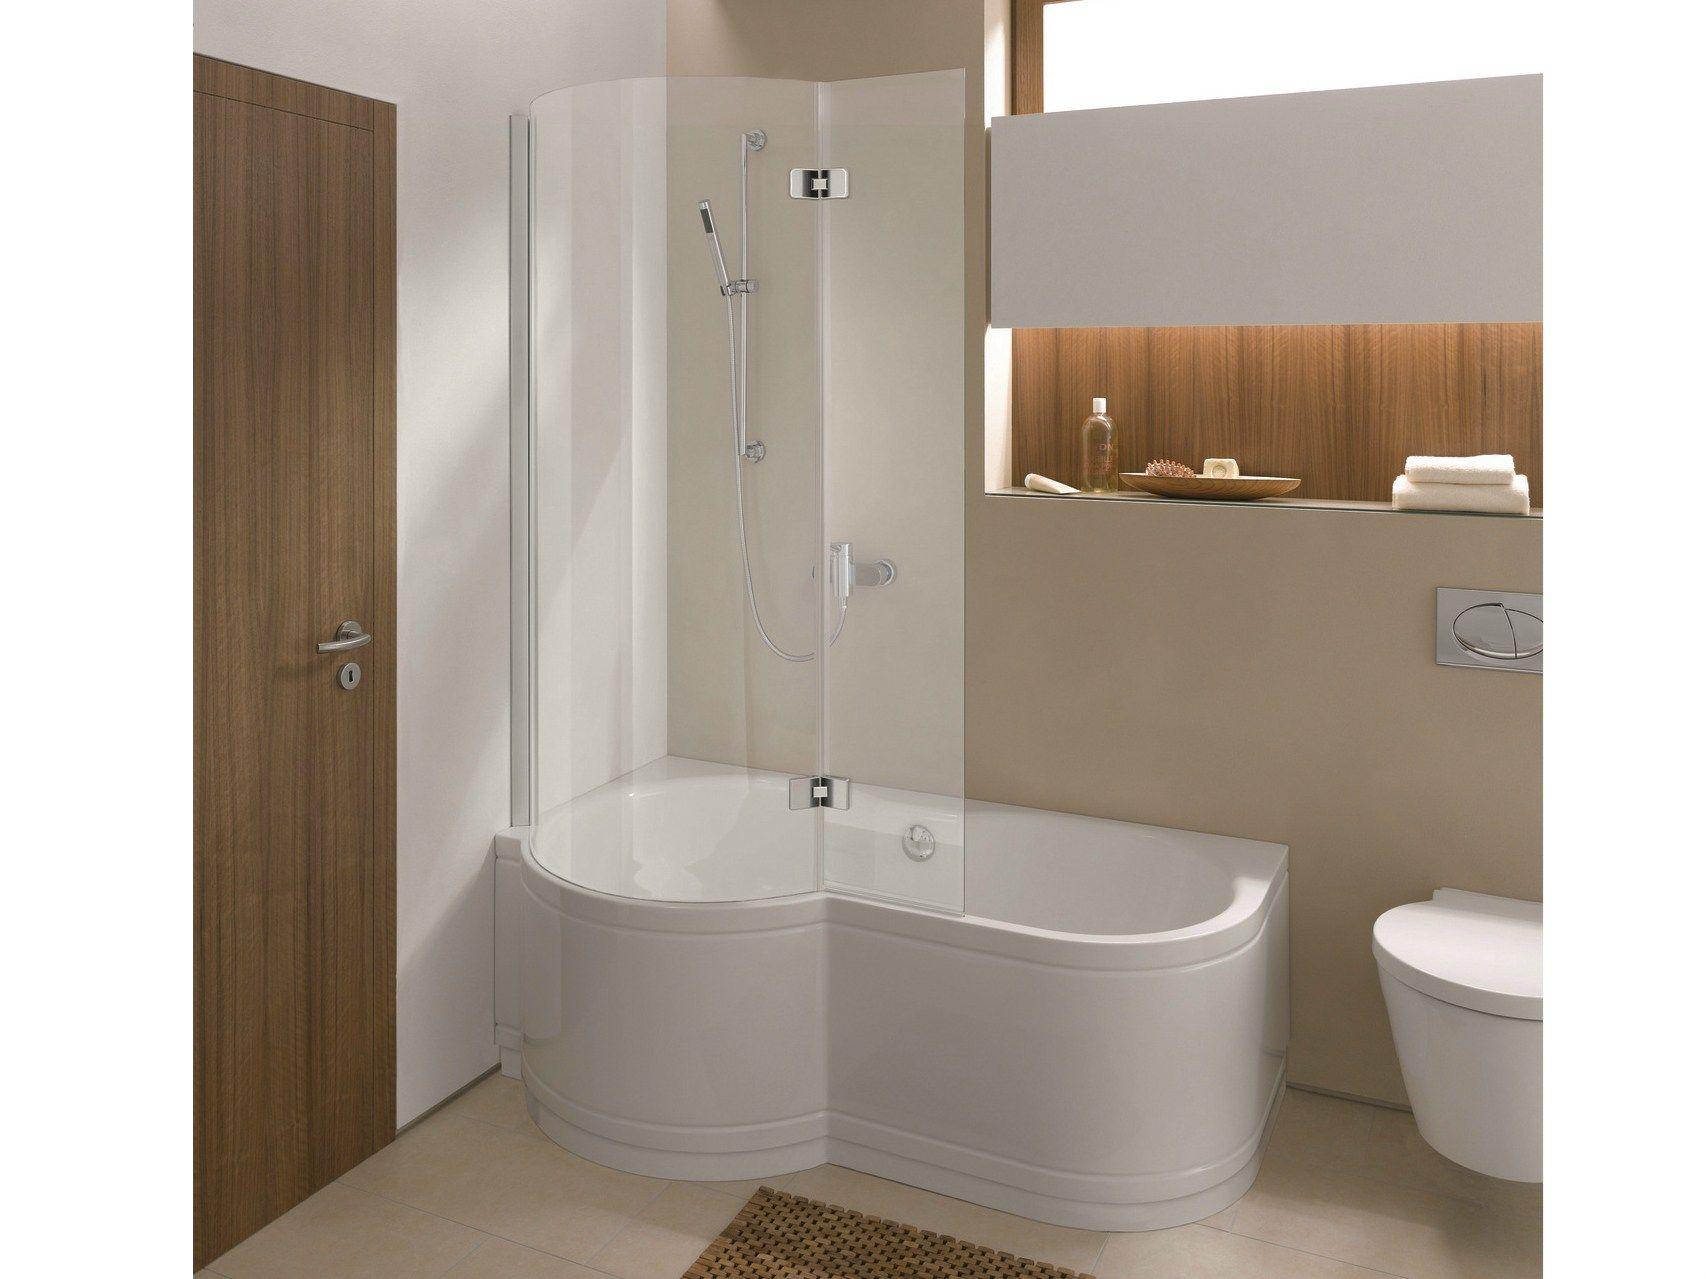 baignoire en acier maill bettecora by bette design. Black Bedroom Furniture Sets. Home Design Ideas